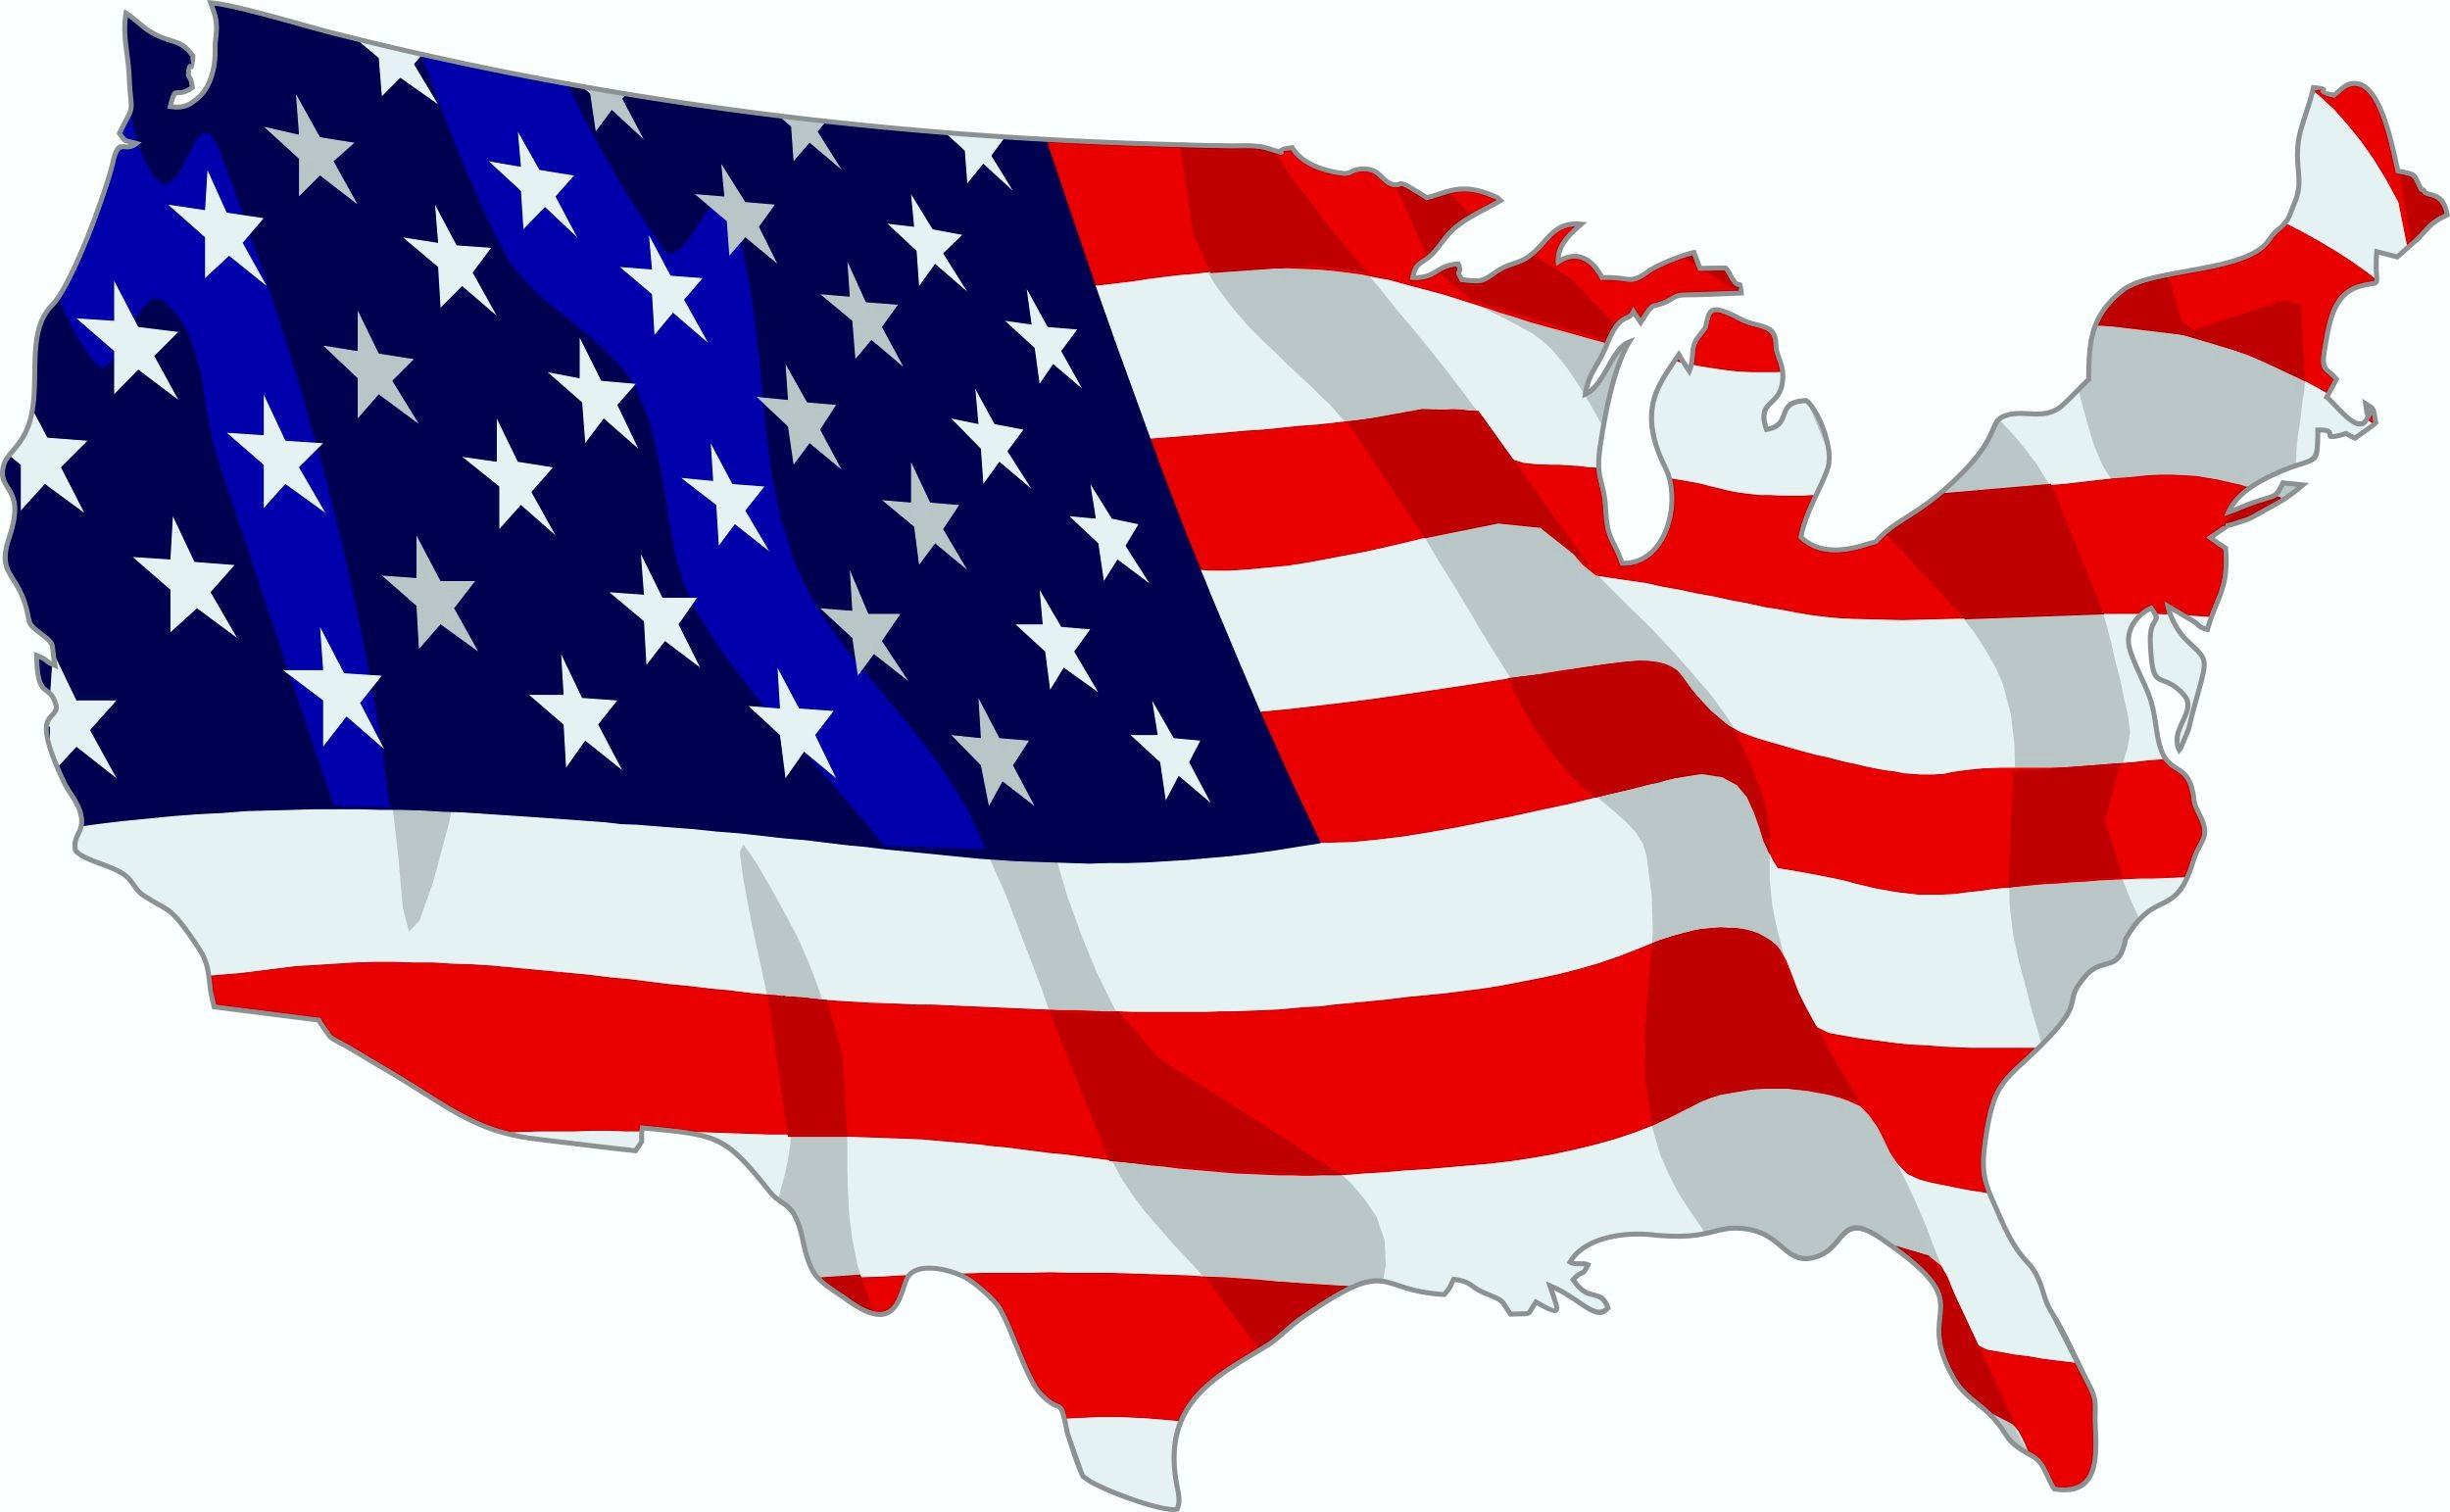 Aufkleber USA Landkontur Dimension 50 x 70 mm